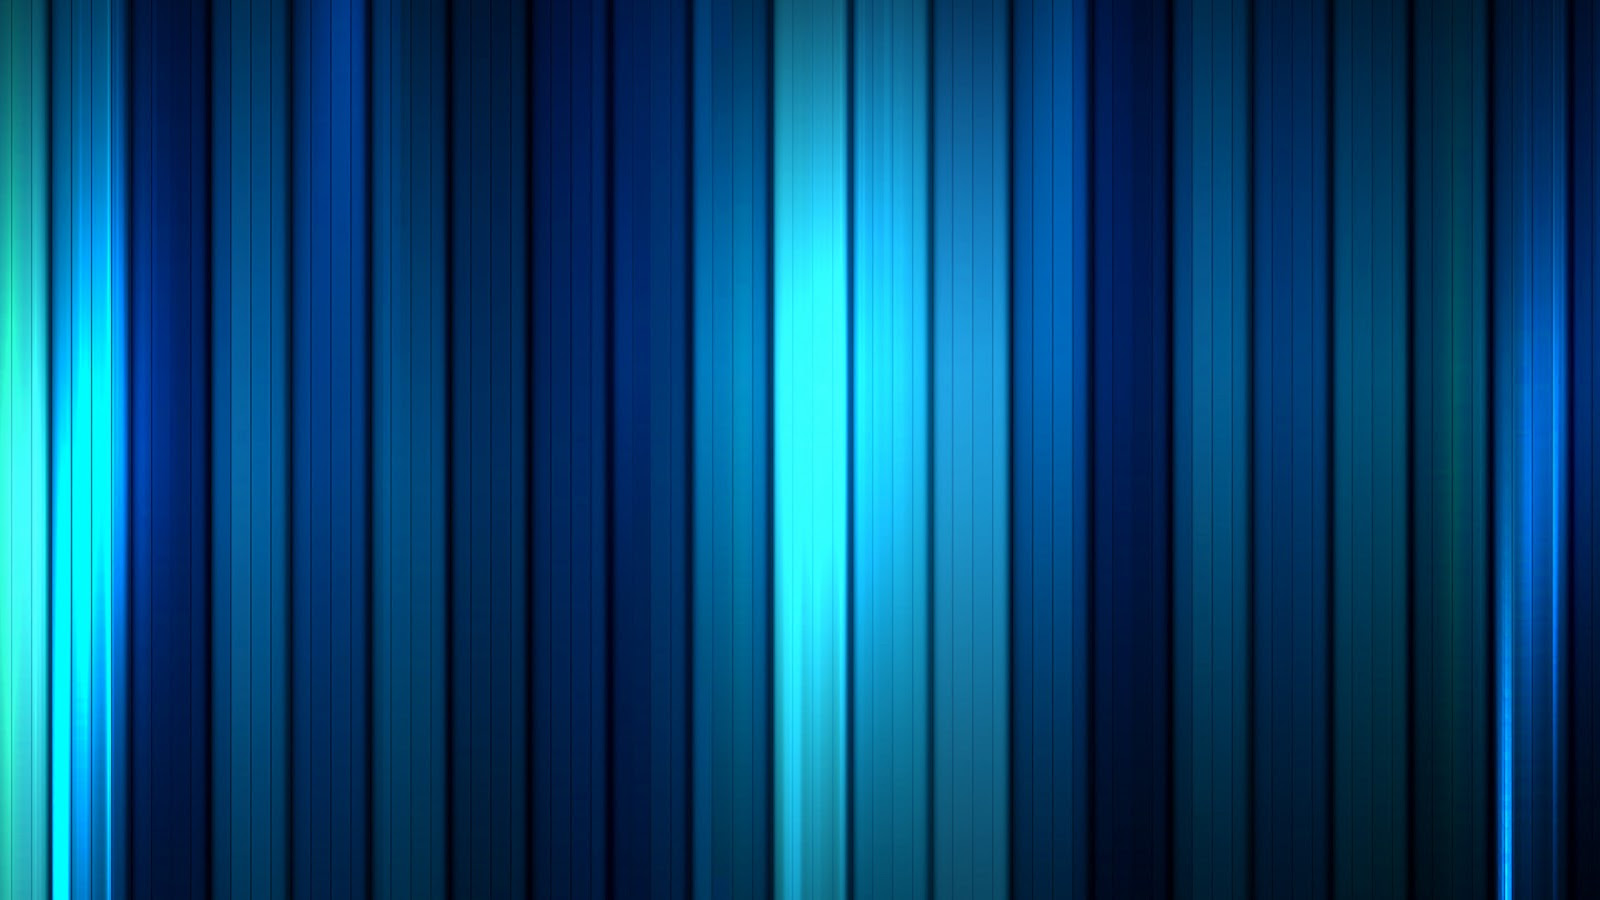 HD Abstract Wallpaper Widescreen  WallpaperSafari